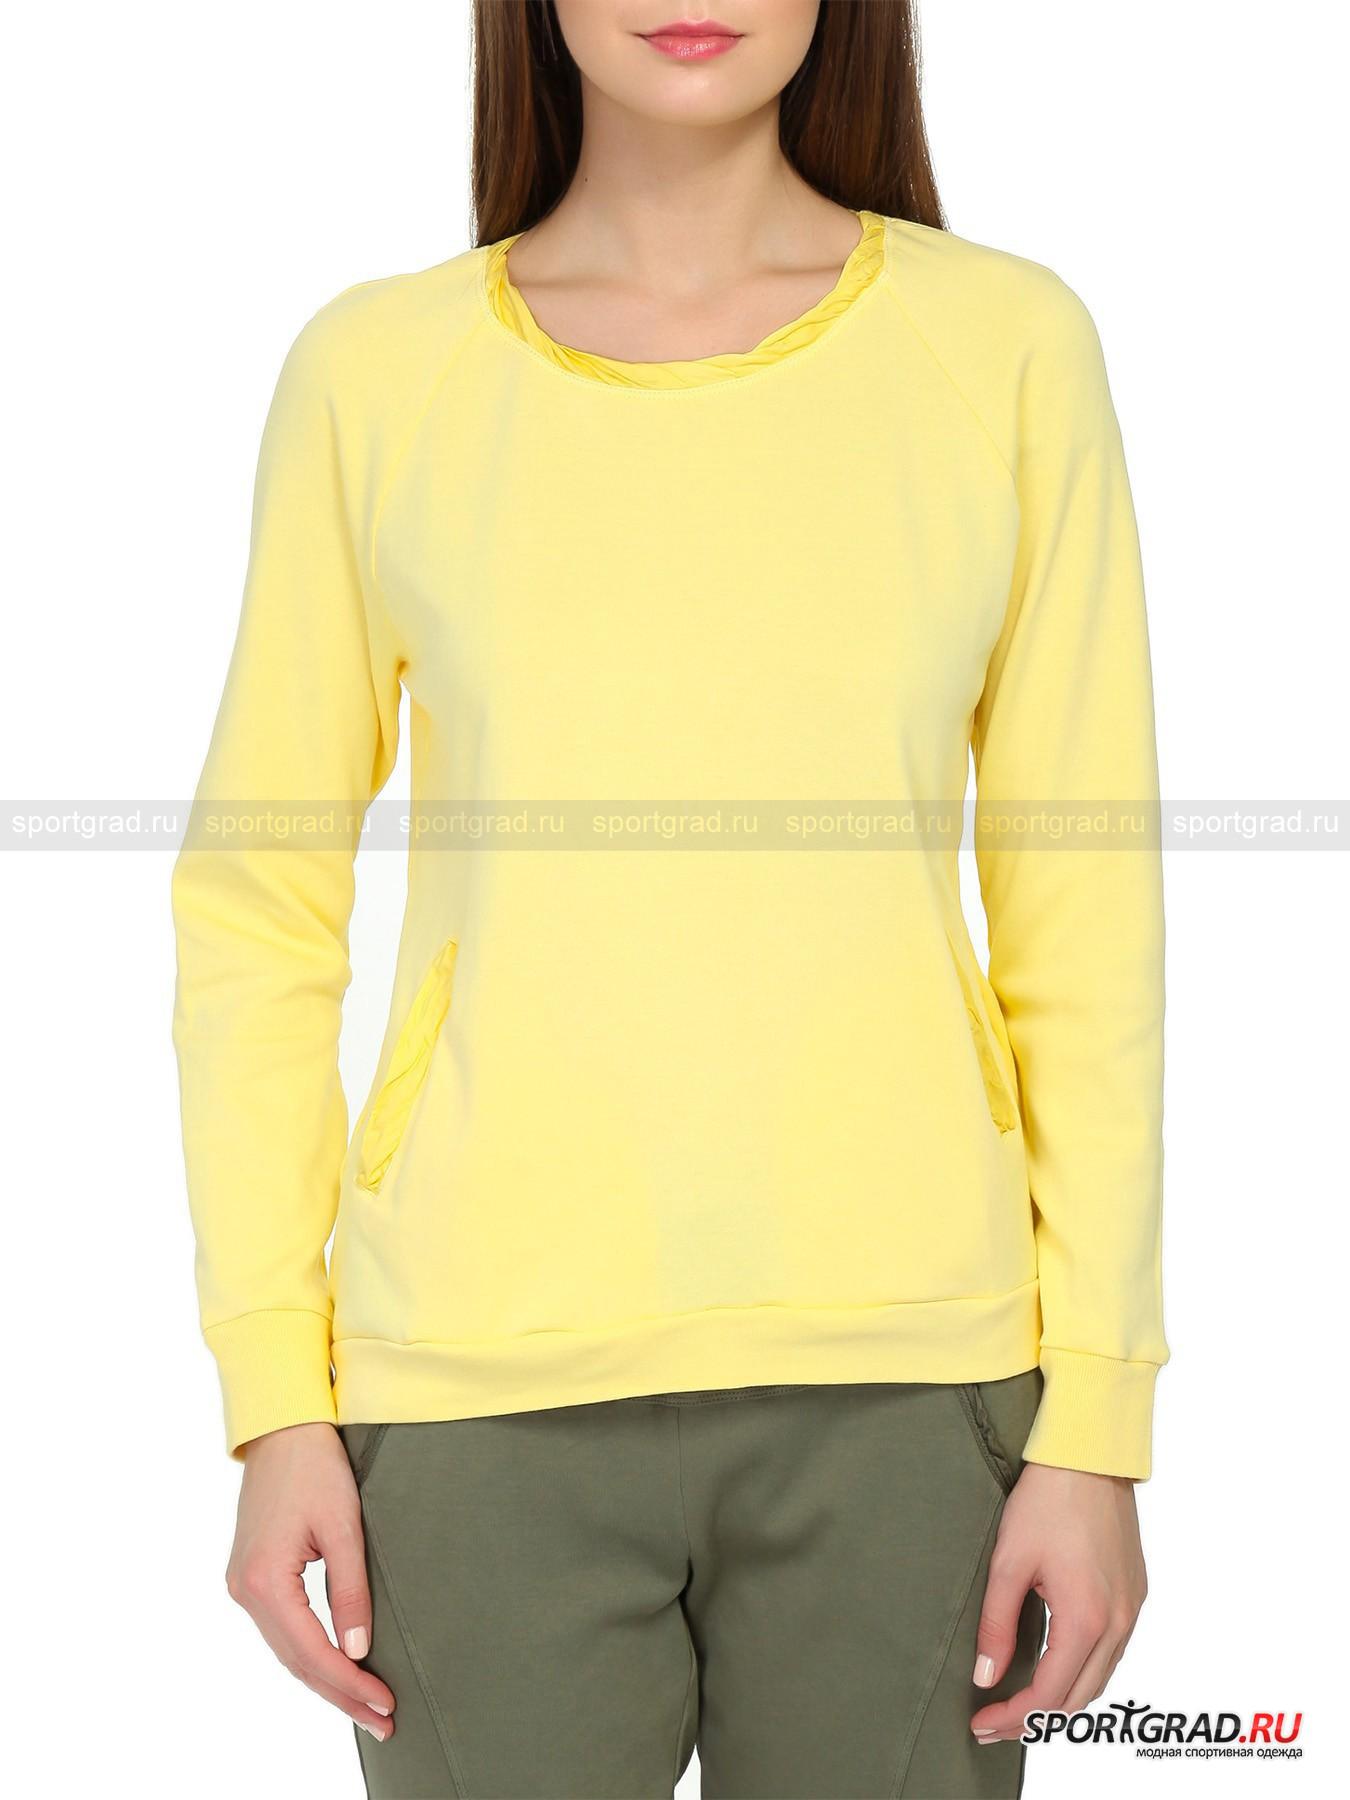 Толстовка женская Swetshirt DEHA от Спортград